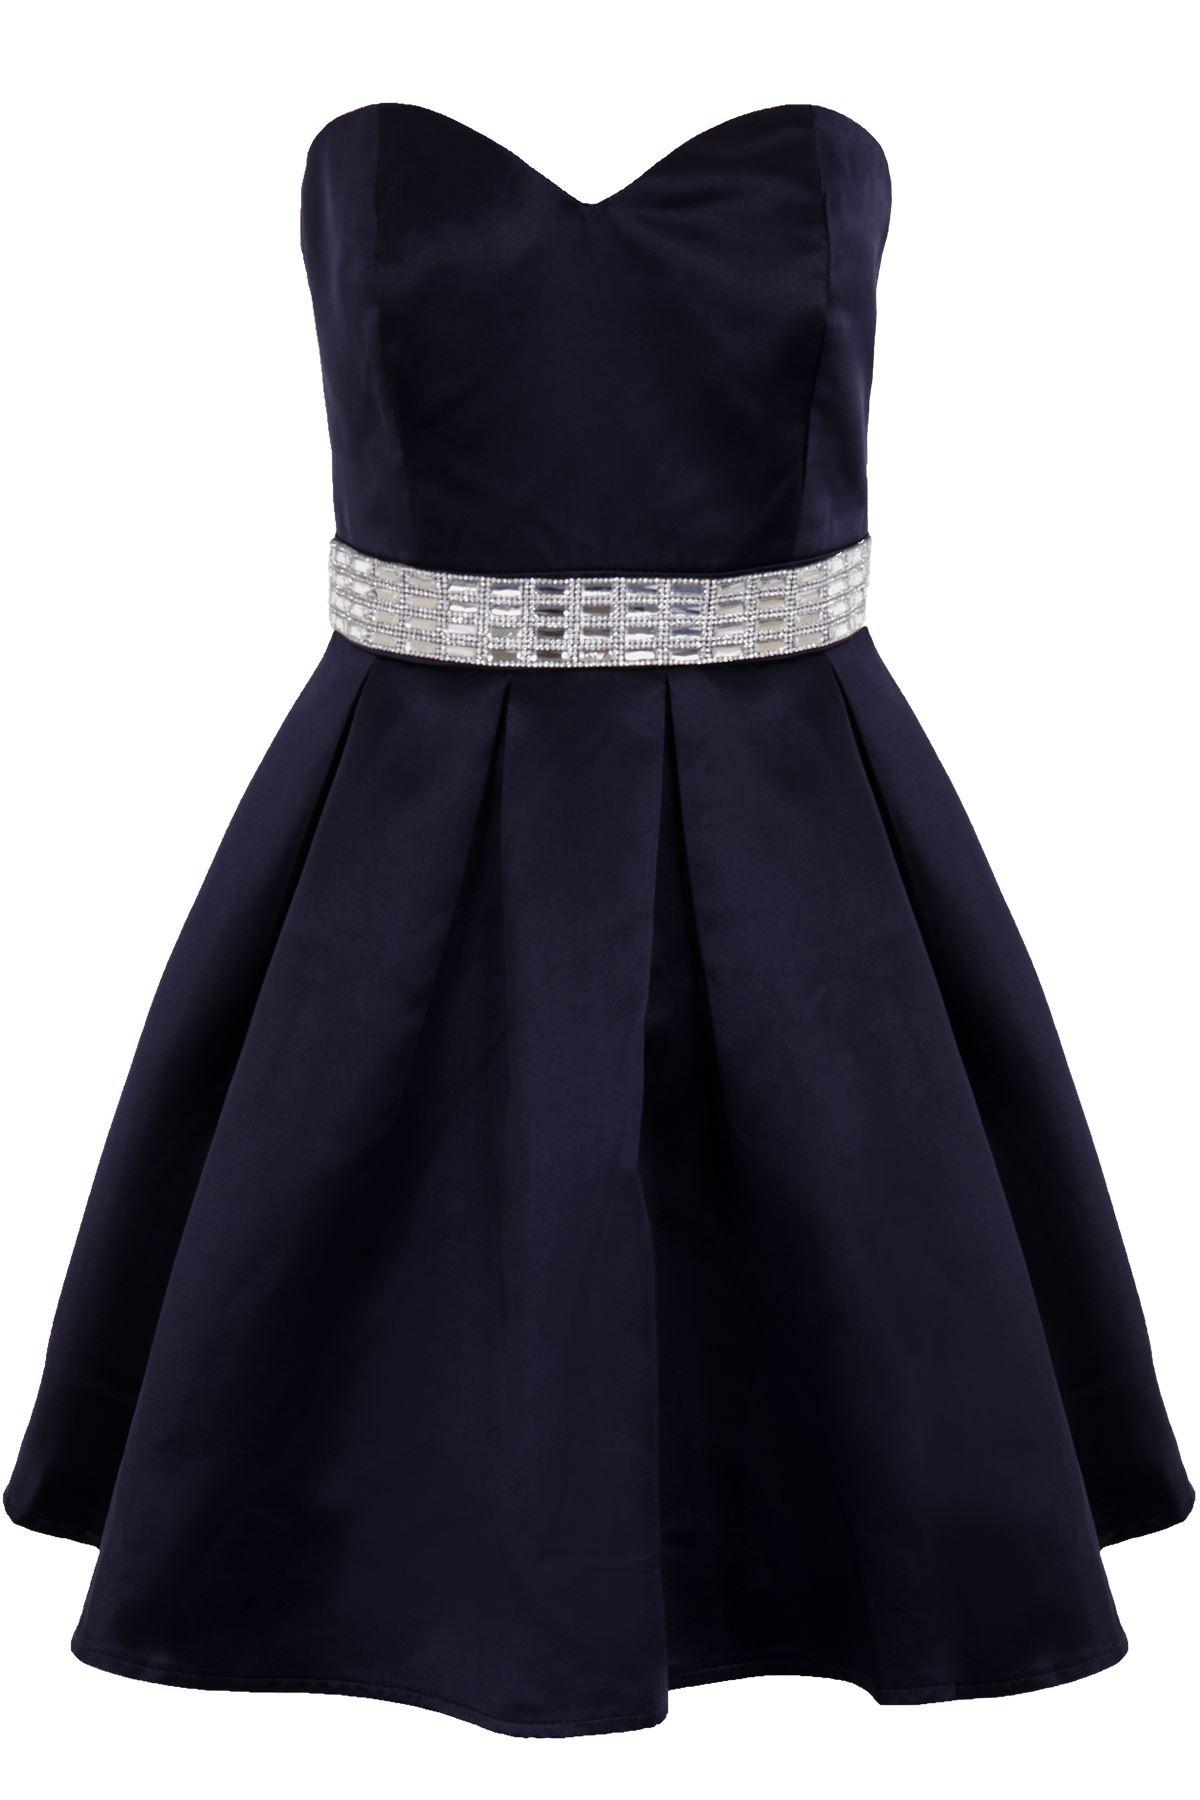 Ladies Bustier Satin Feel Diamante Waist Women/'s Pleated Cocktail Skater Dress